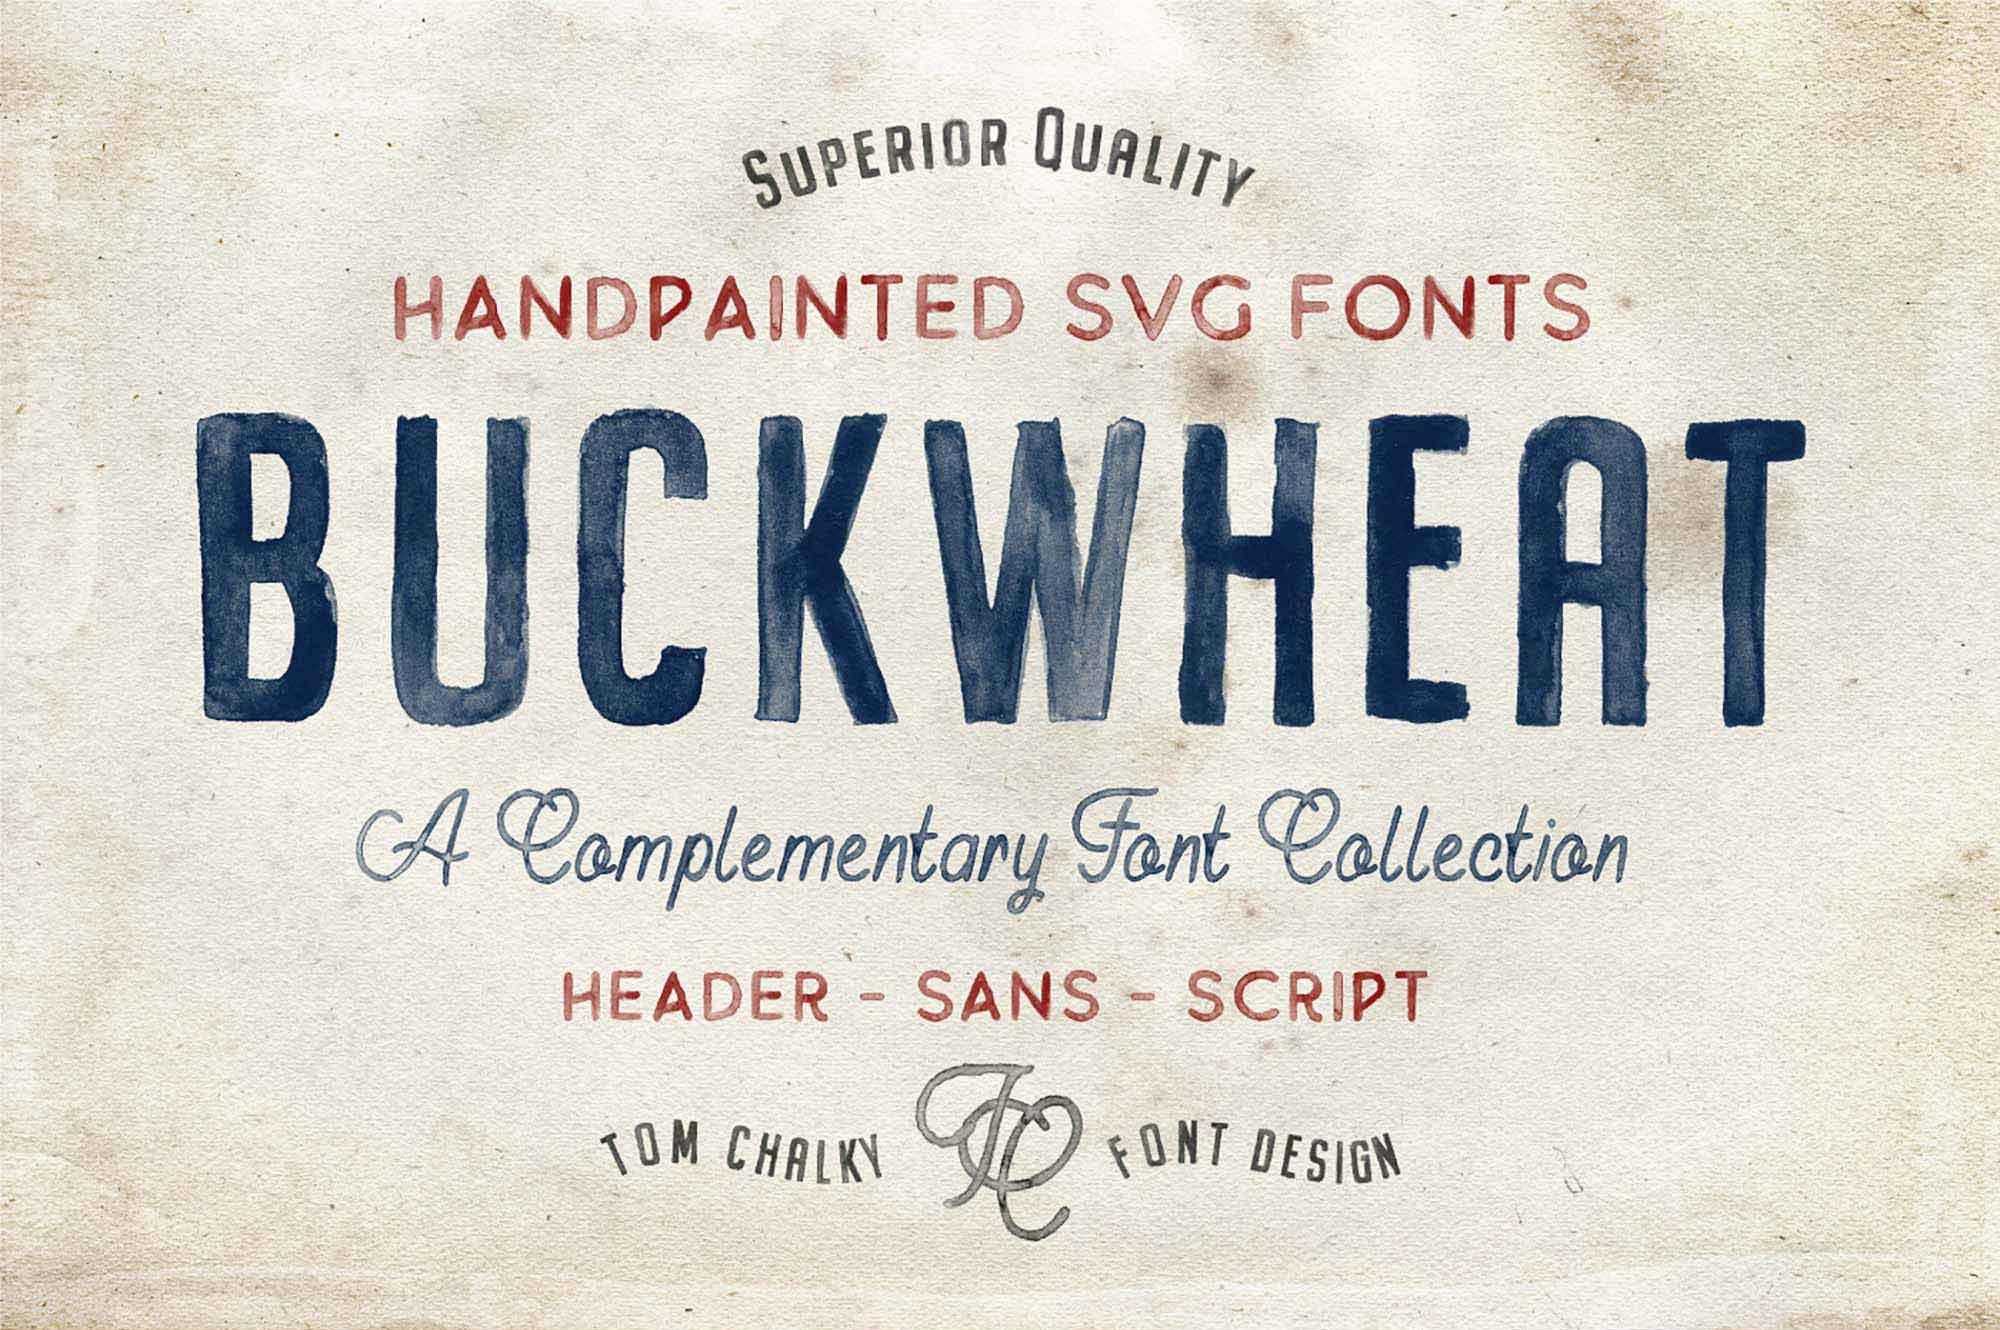 Buckwheat Hand-painted Font